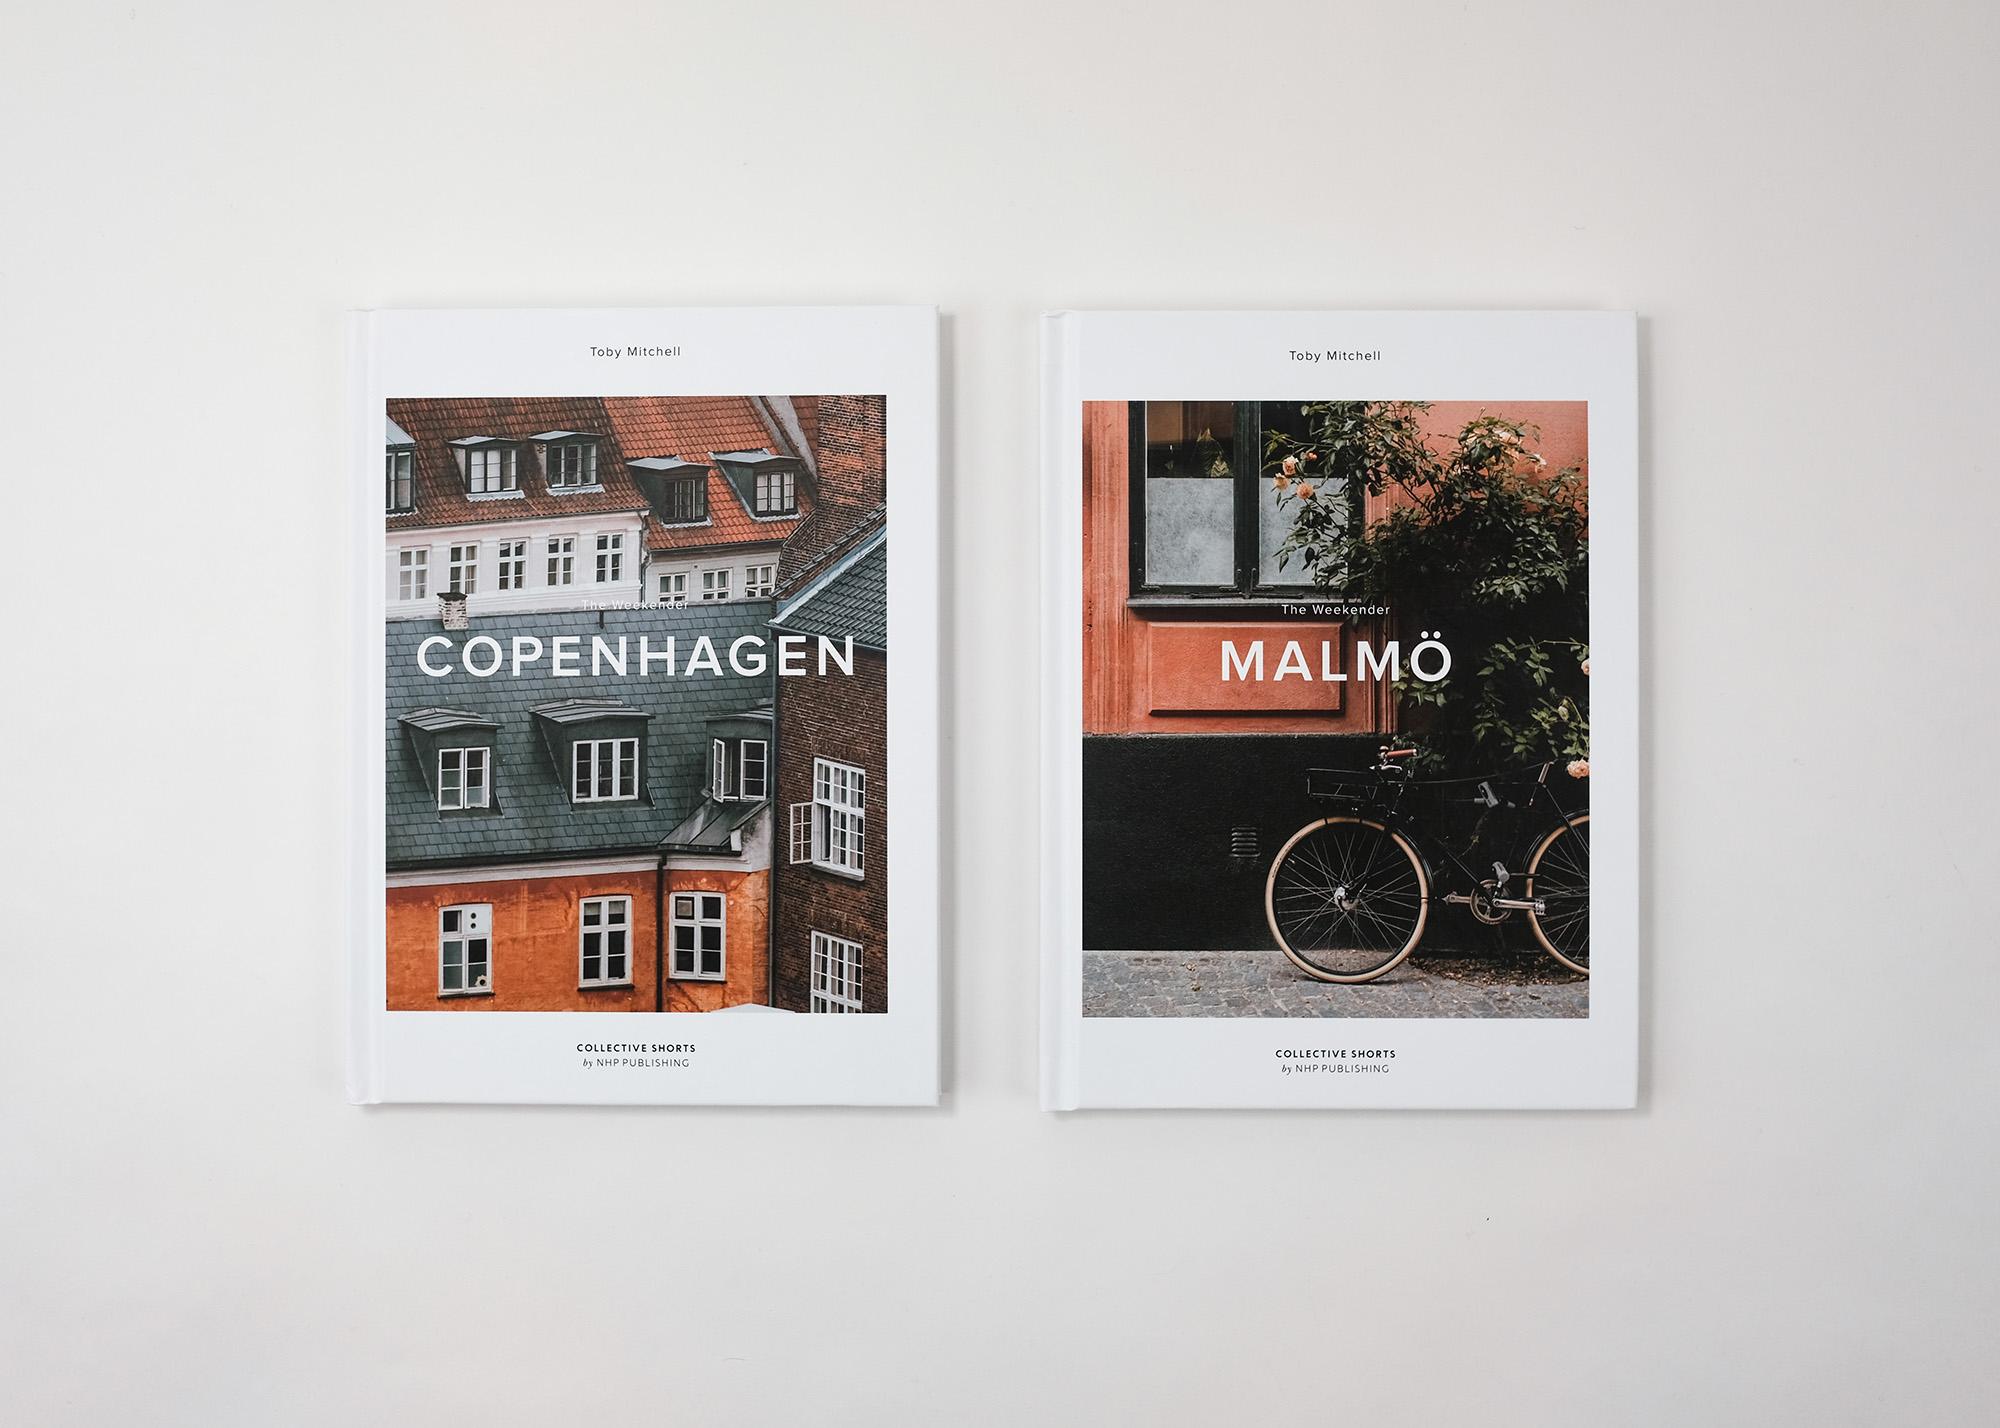 toby-mitchell_weekender_copenhagen_malmo_photobooks_daniel-zachrisson3.jpg